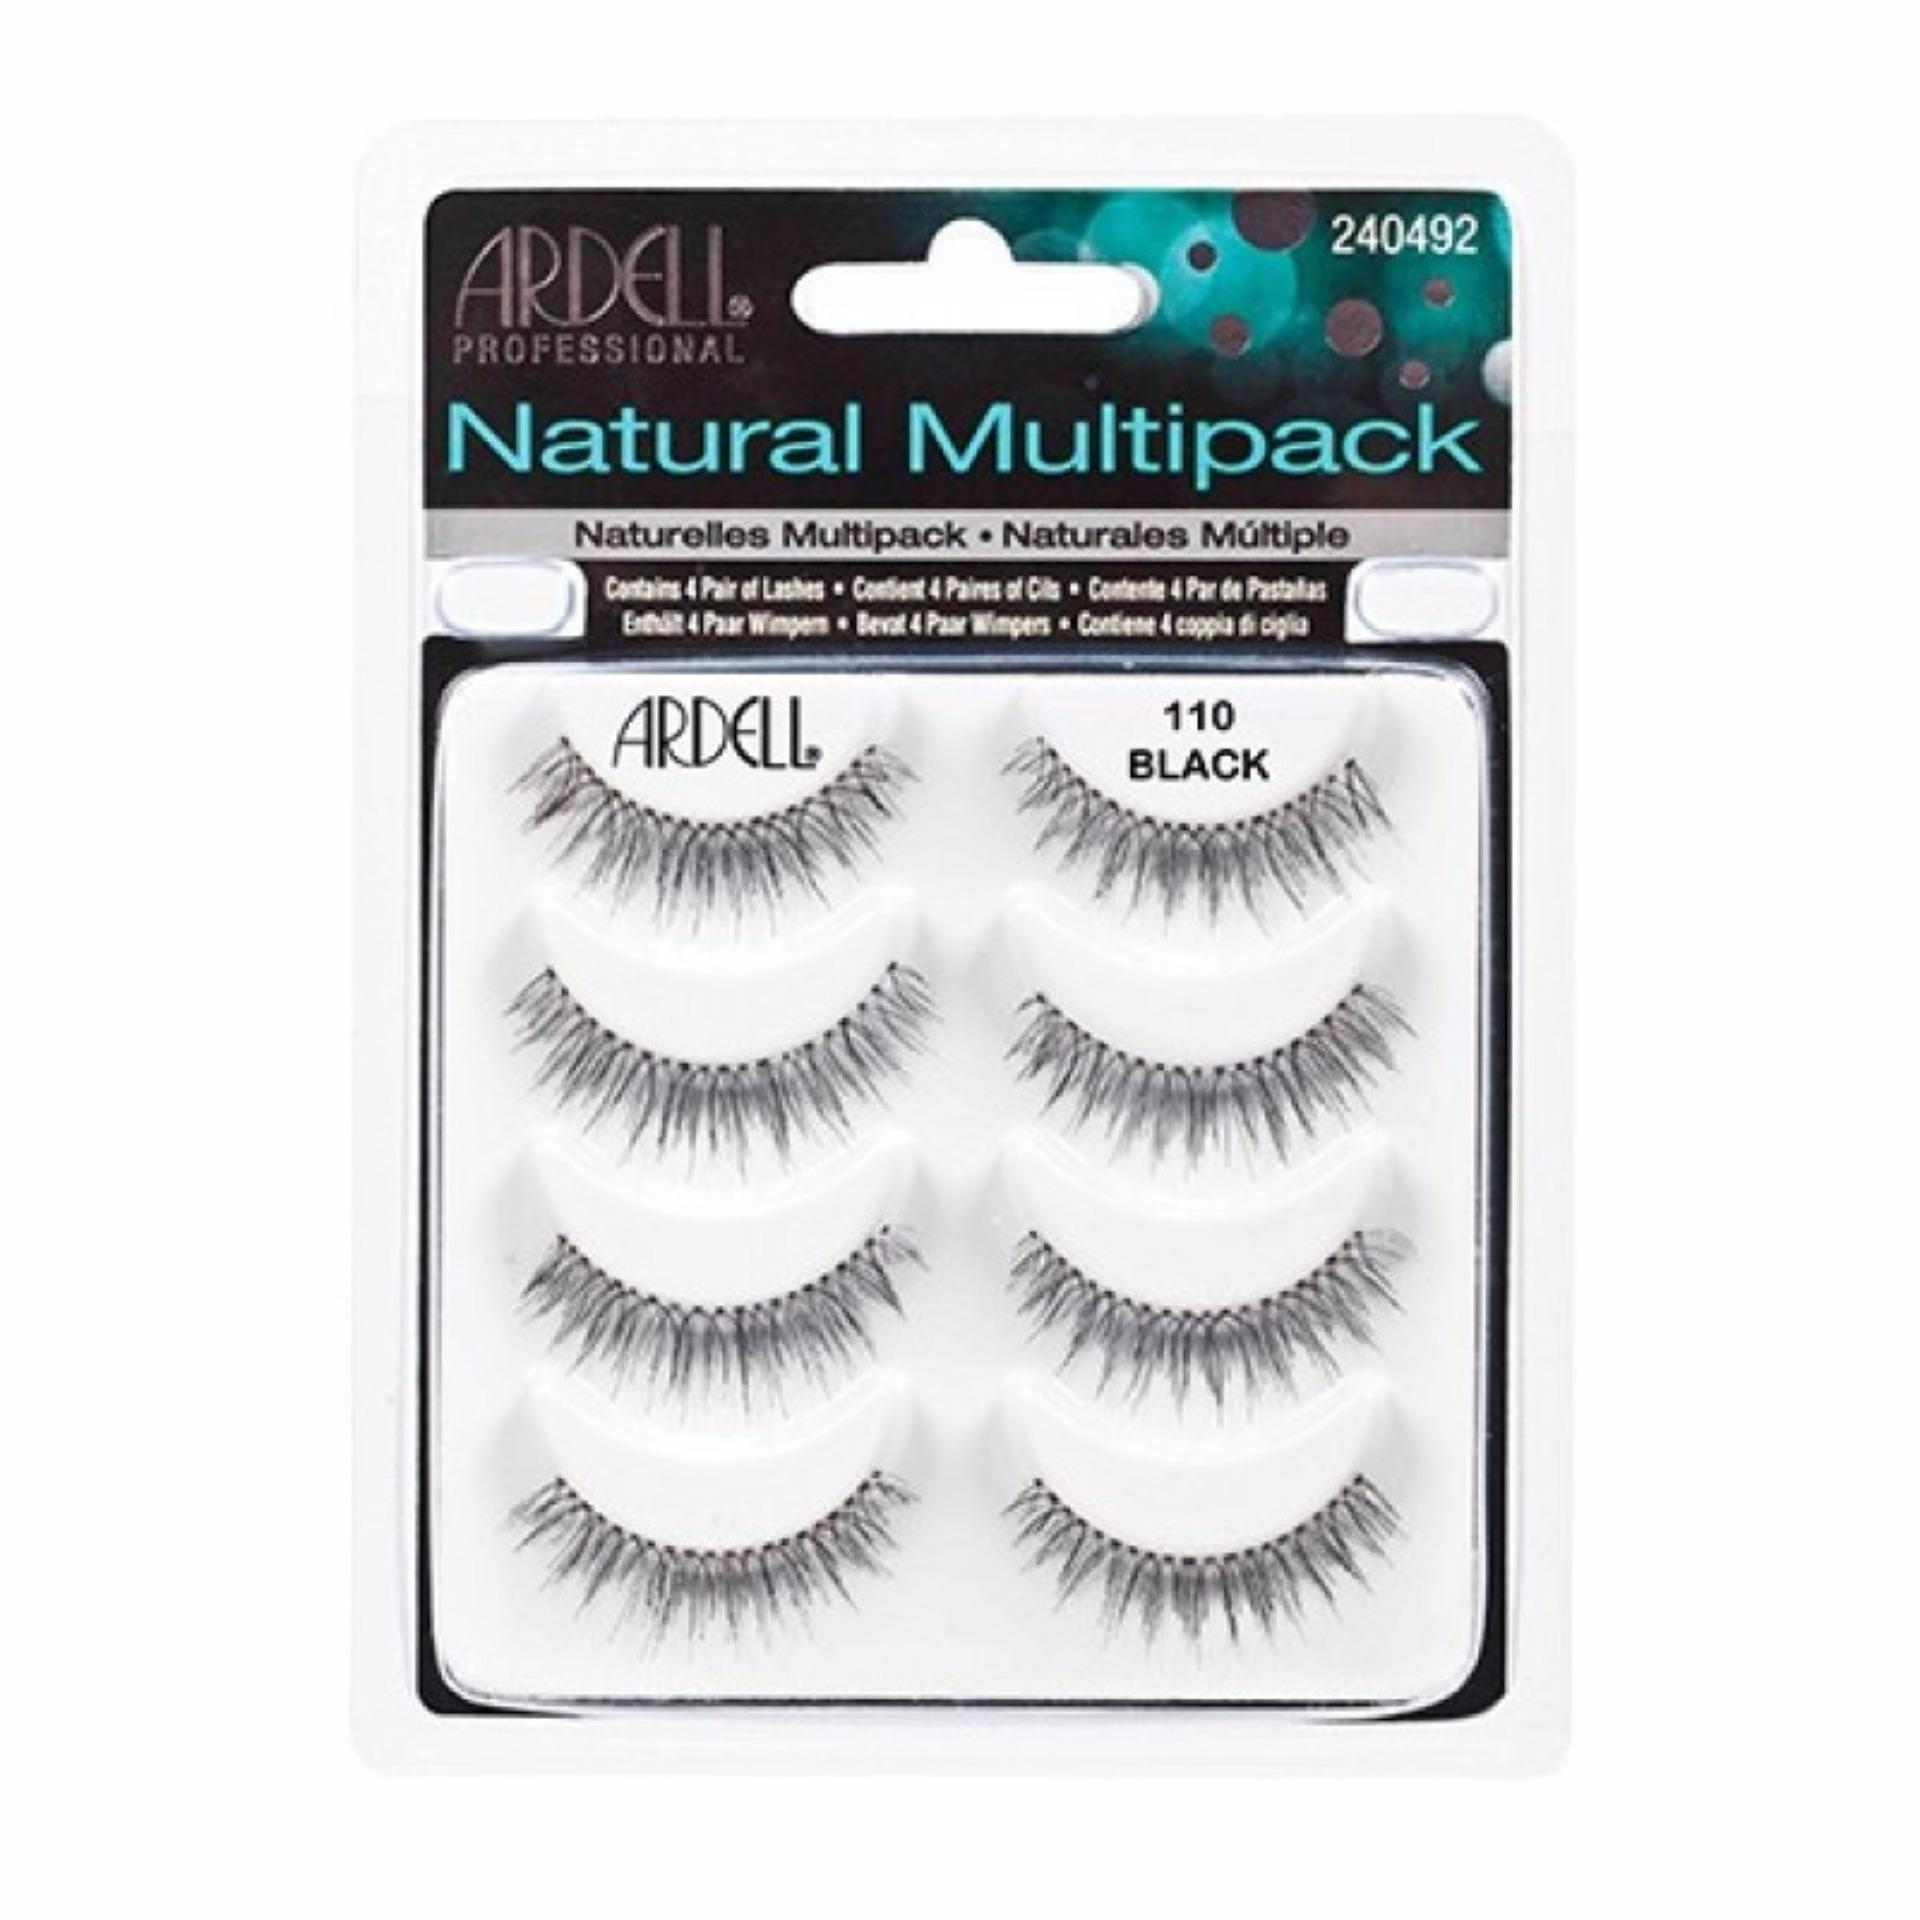 Ardell Fashion Lashes 62010 120 Demi Black Bulu Mata Palsu 100 Alami 60310 103 Charme Drama Queen Handmade Source Natural Multipack 110